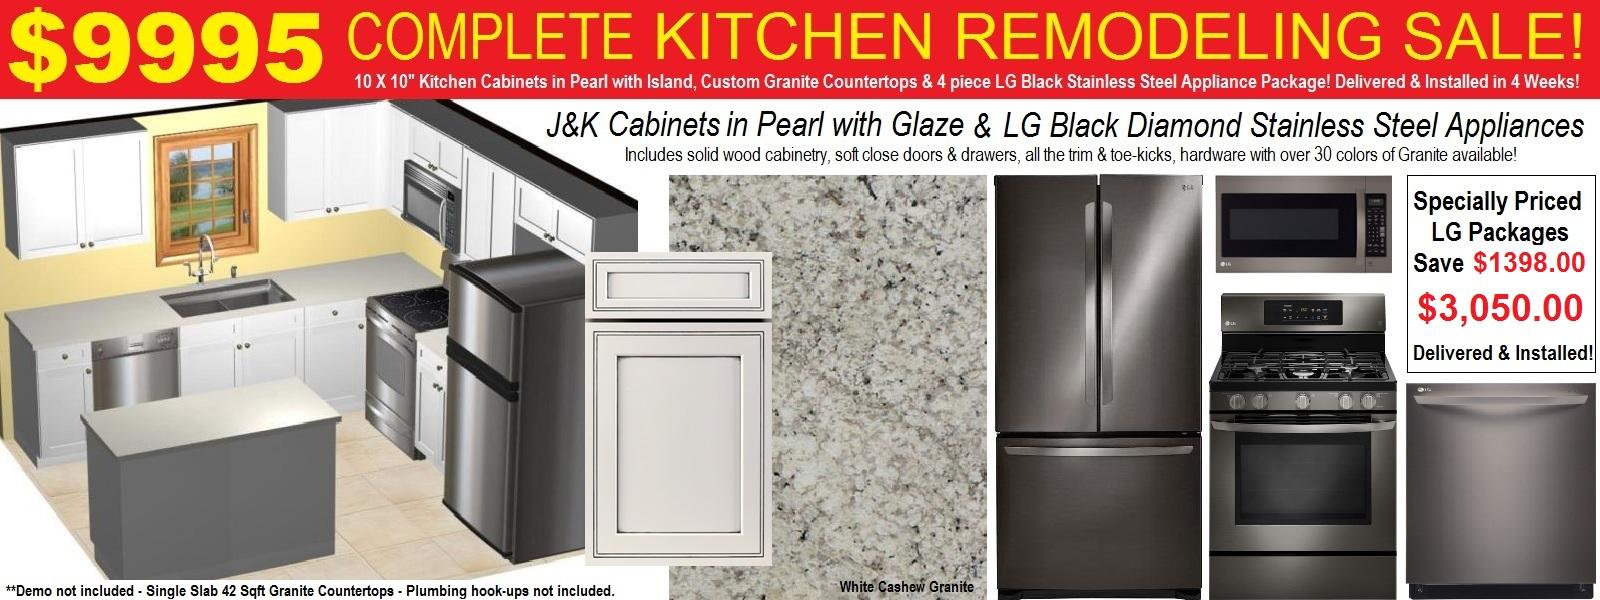 kitchenazcabinets kitchen remodel scottsdale Kitchen Cabinets Countertops Glendale AZ